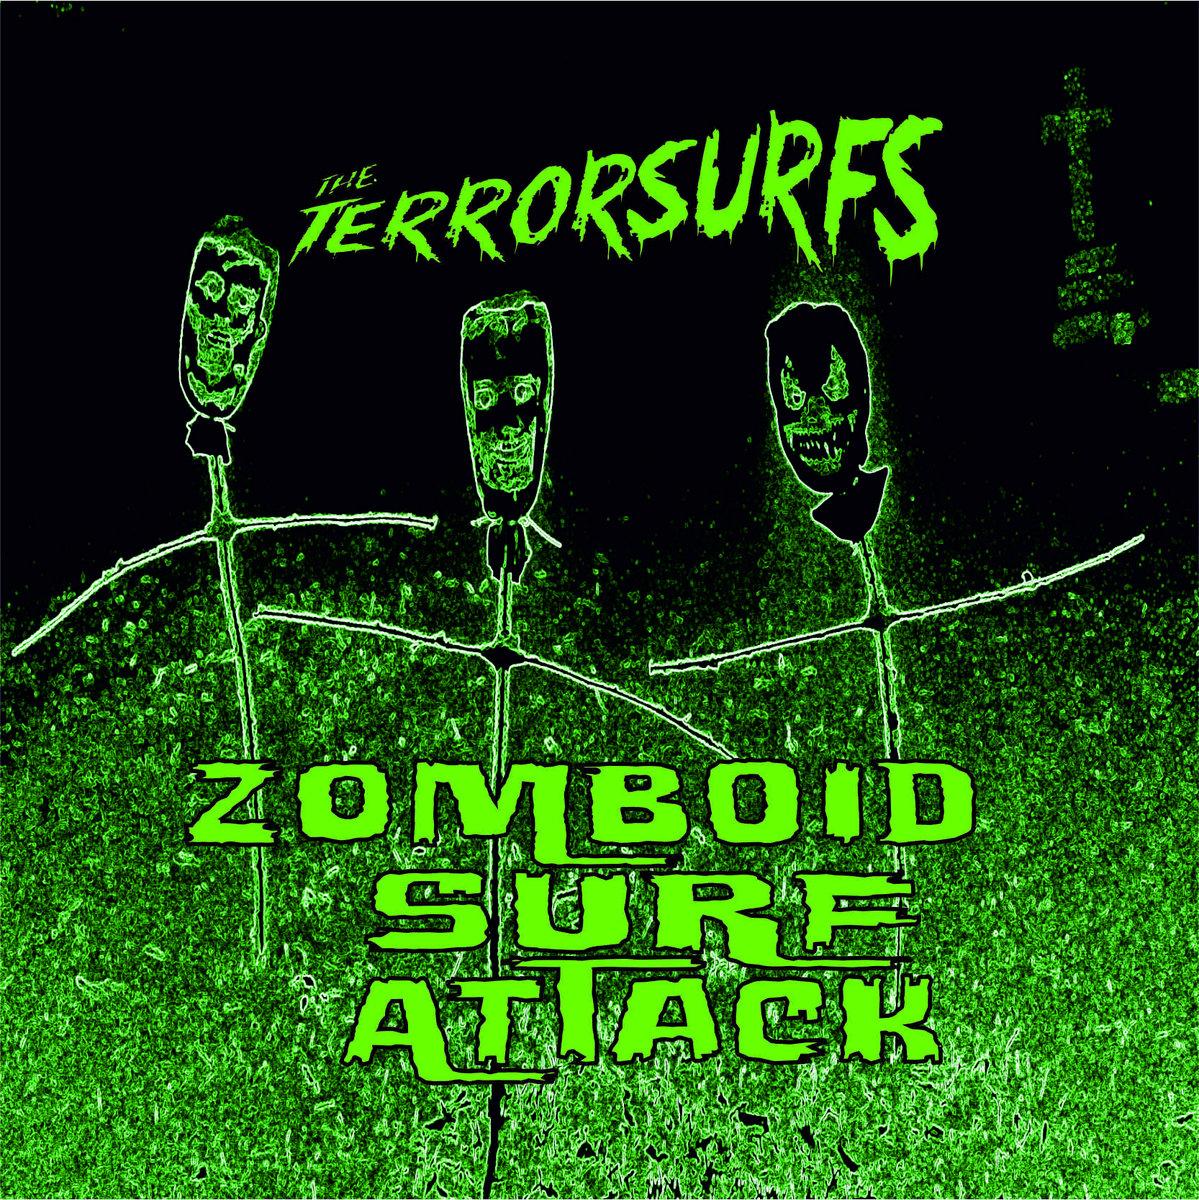 The Terrorsurfs –Zomboid Surf Attack